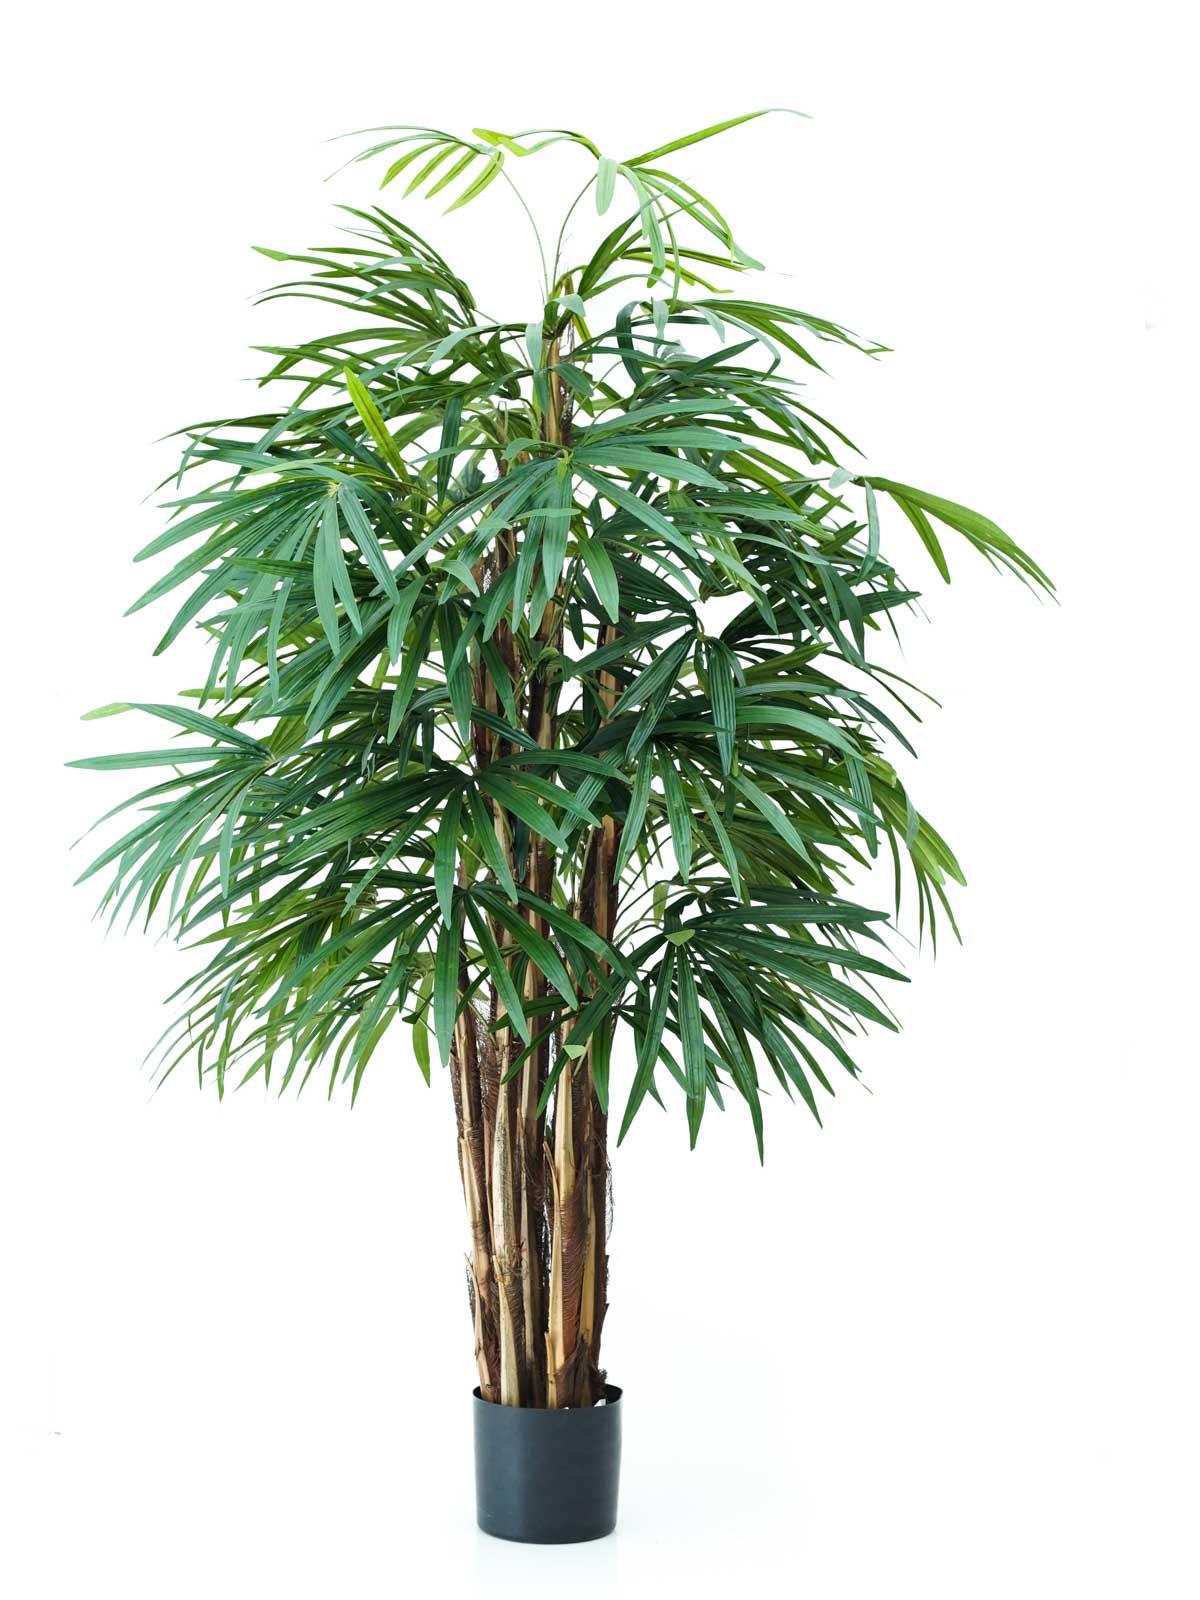 Bamboo - Buddha Tree Artificial Plants